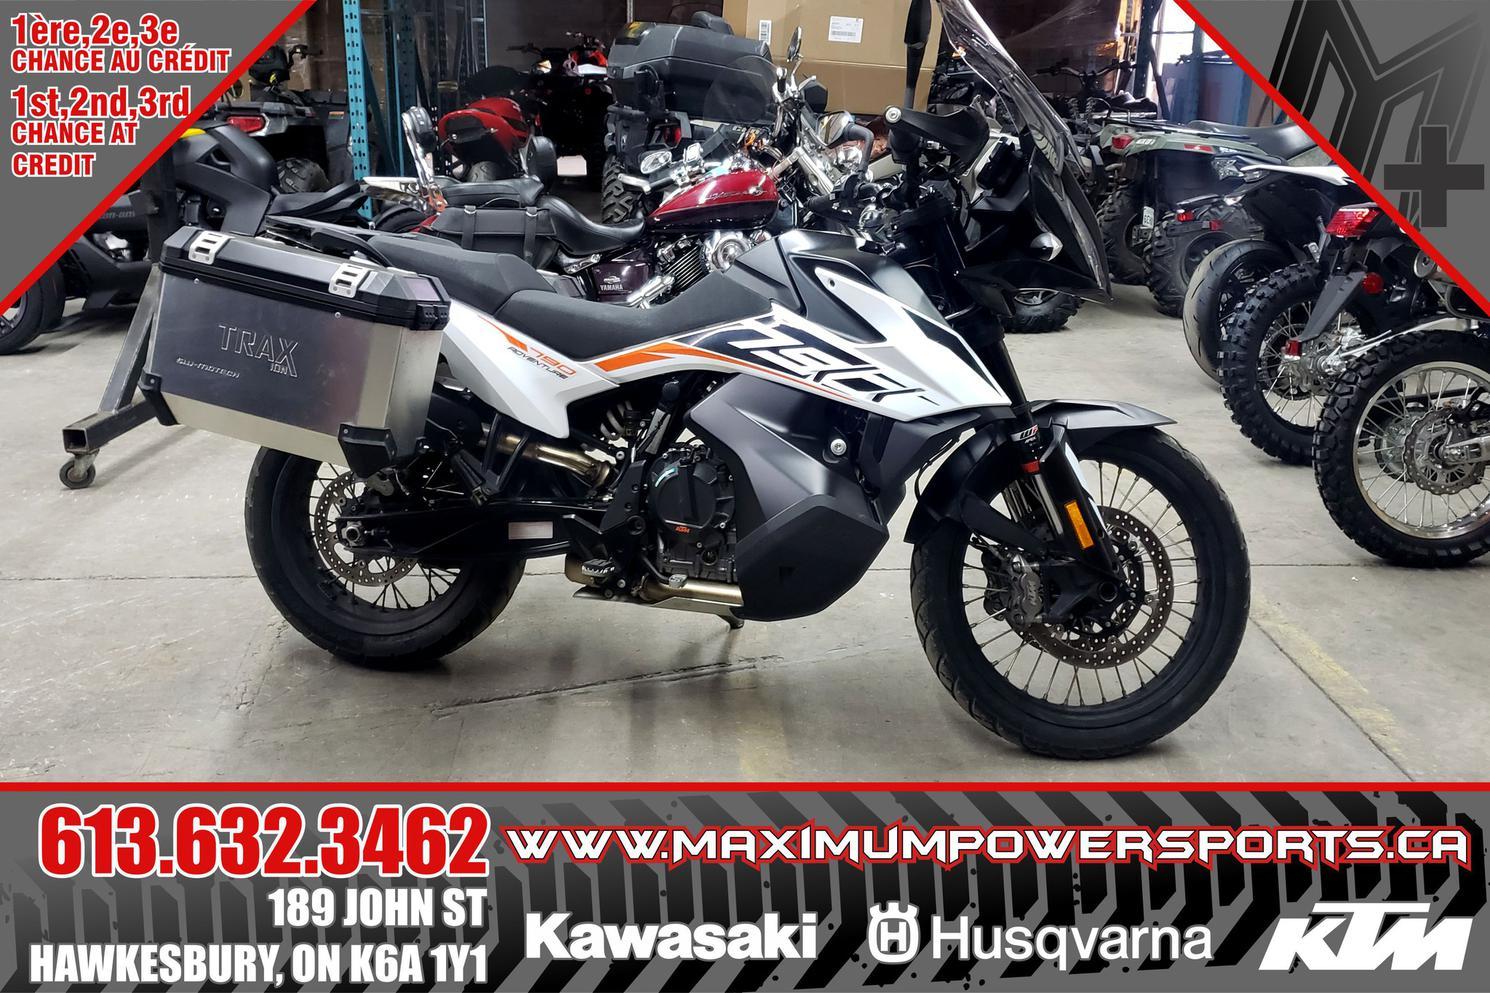 KTM ADVENTURE 890 2020 - ADVENTURE 890